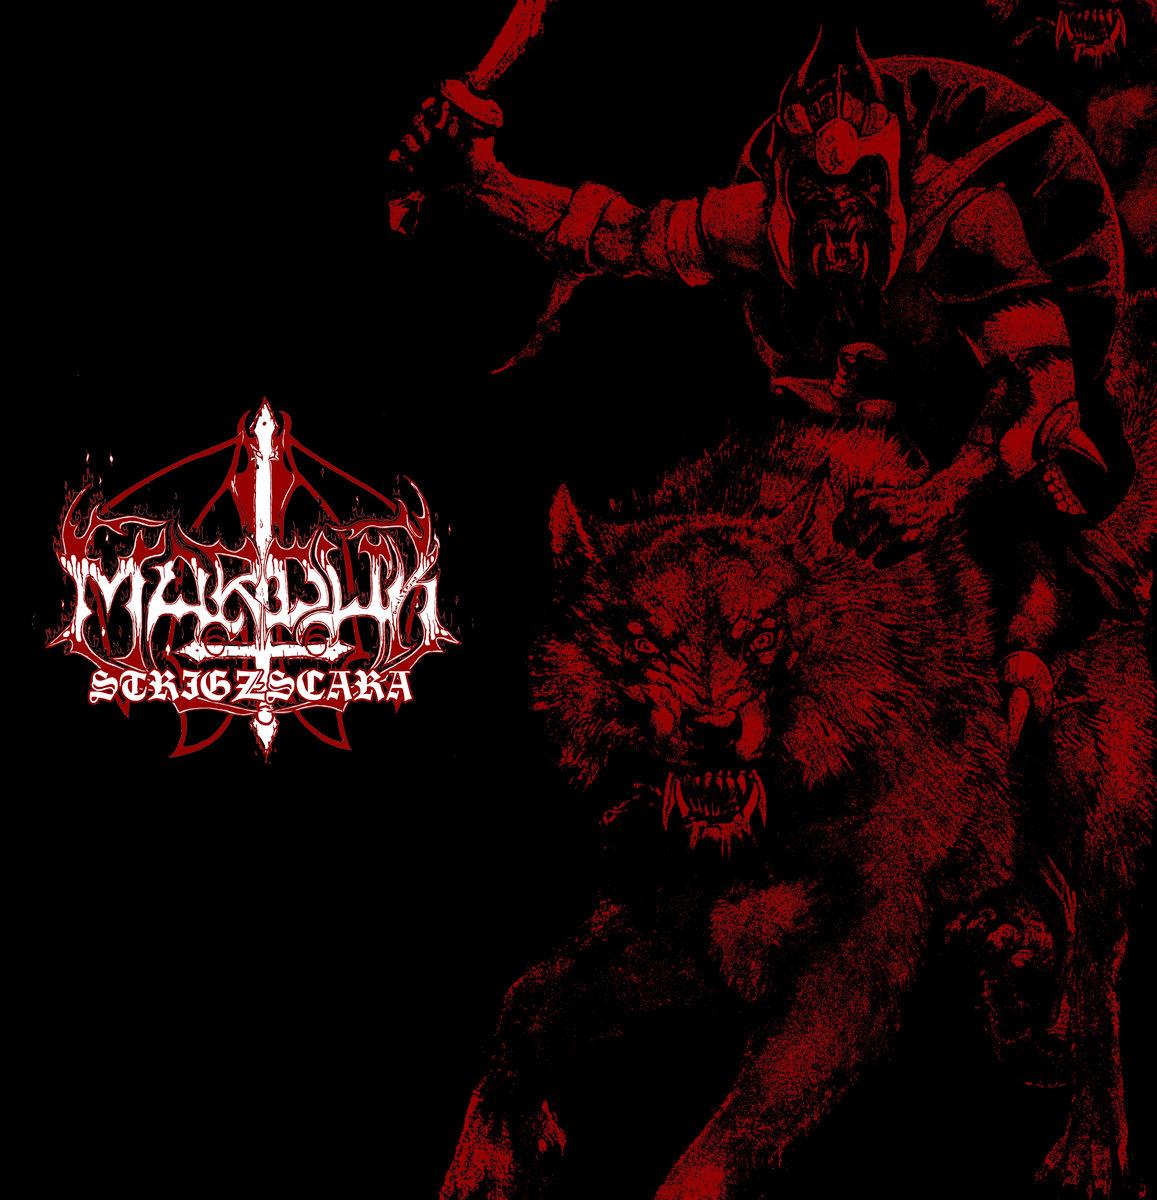 MARDUK - Strigzscara - Warwolf Digi CD